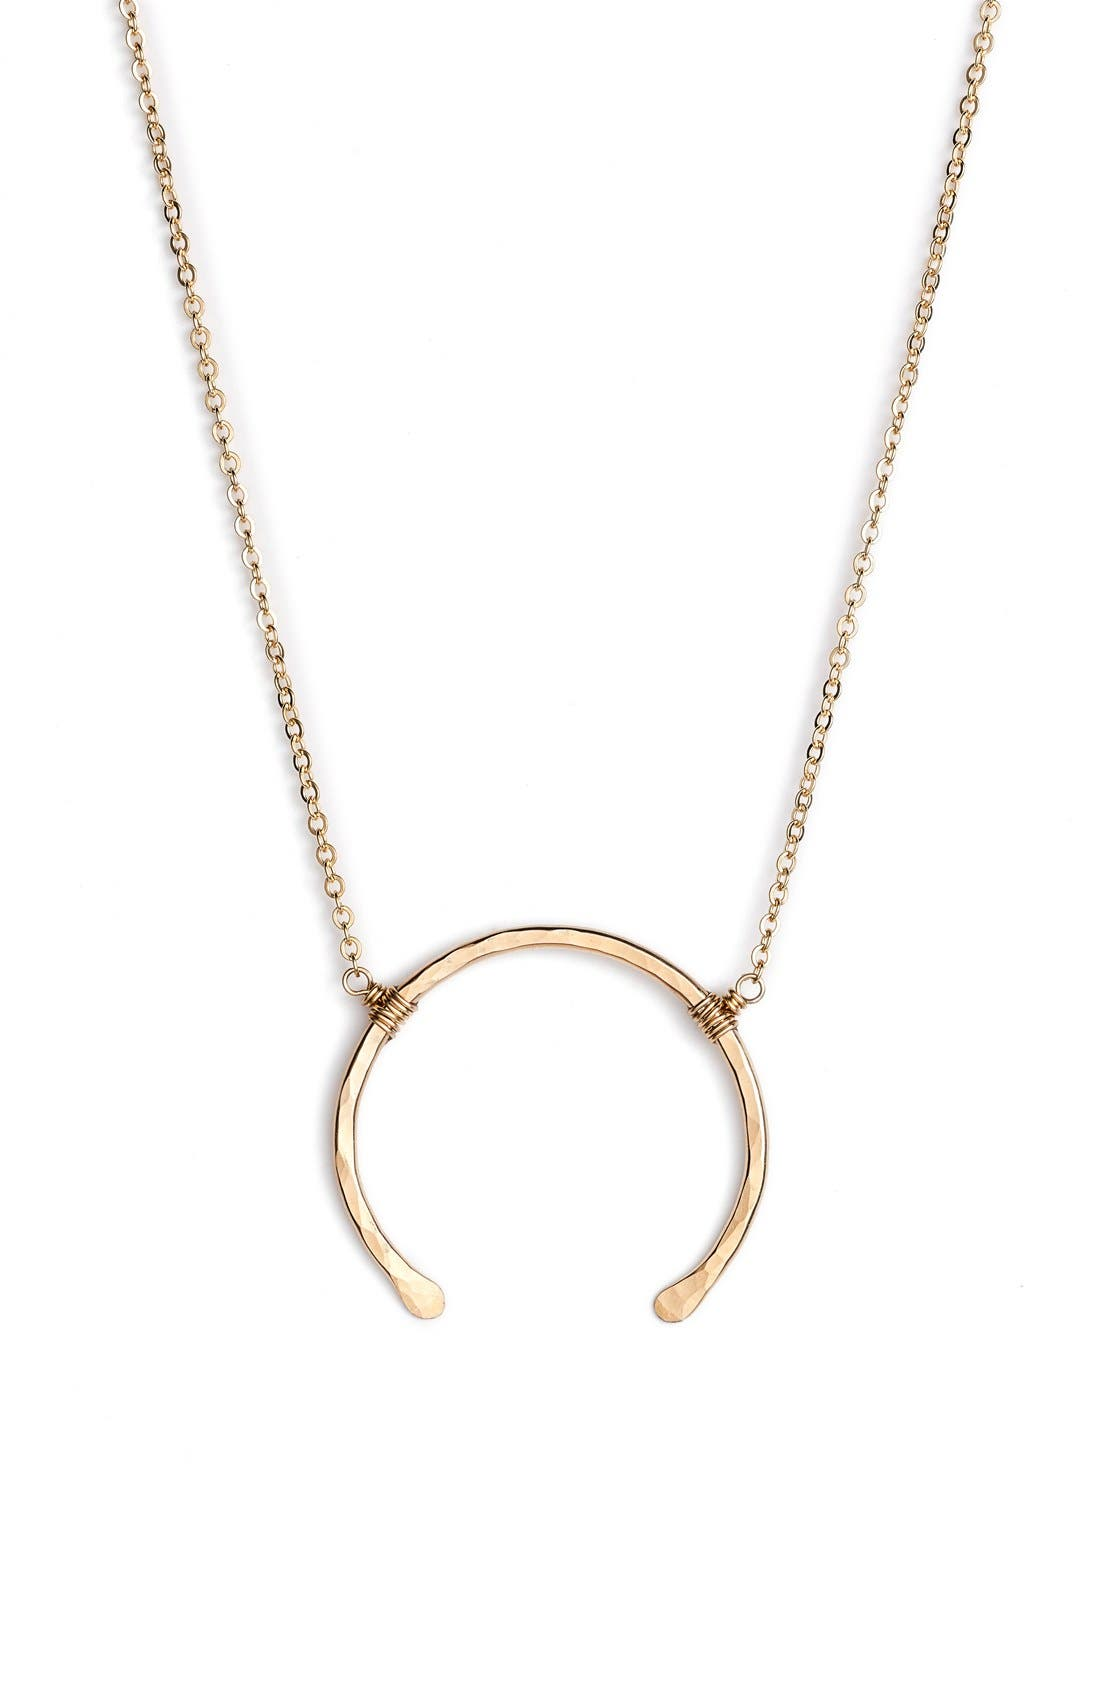 Nashelle 'Imogen' Crescent Pendant Necklace